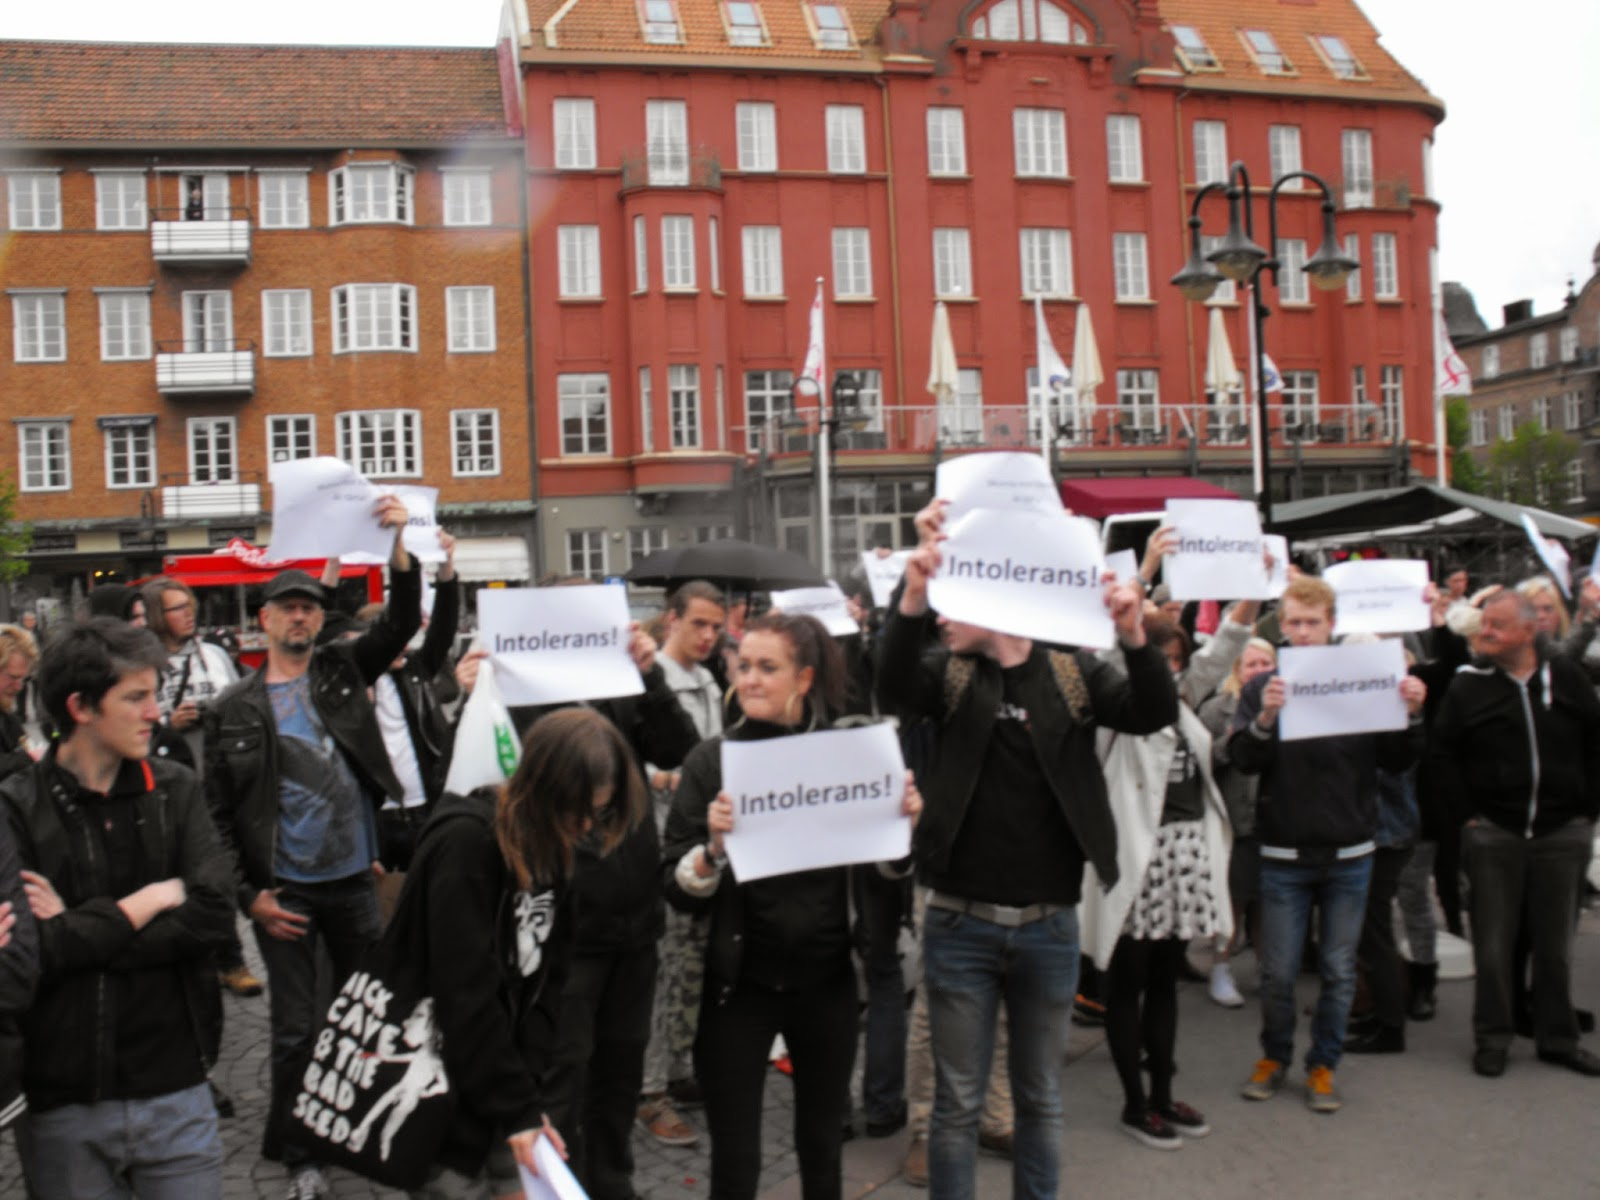 Tårtkalas mot Sverigedemokraterna - Mumsa mot rasism!